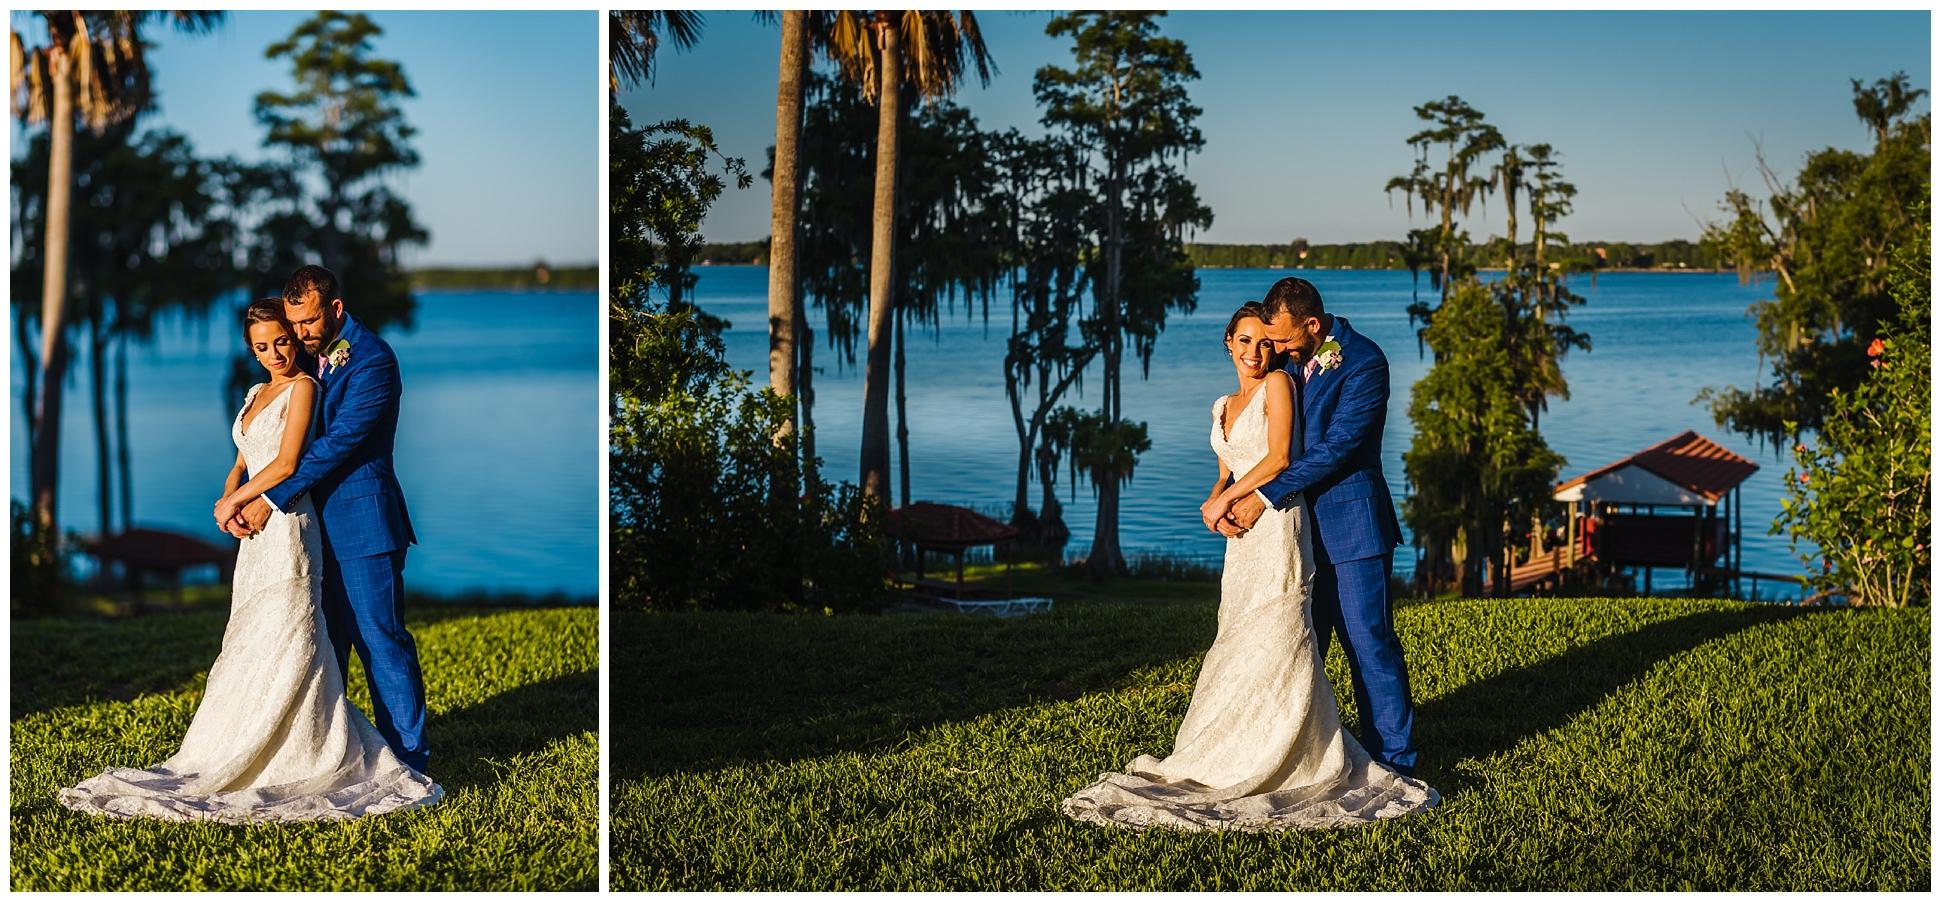 Tampa-luxury-wedding-photographer-mision-lago-private-estate_0045.jpg